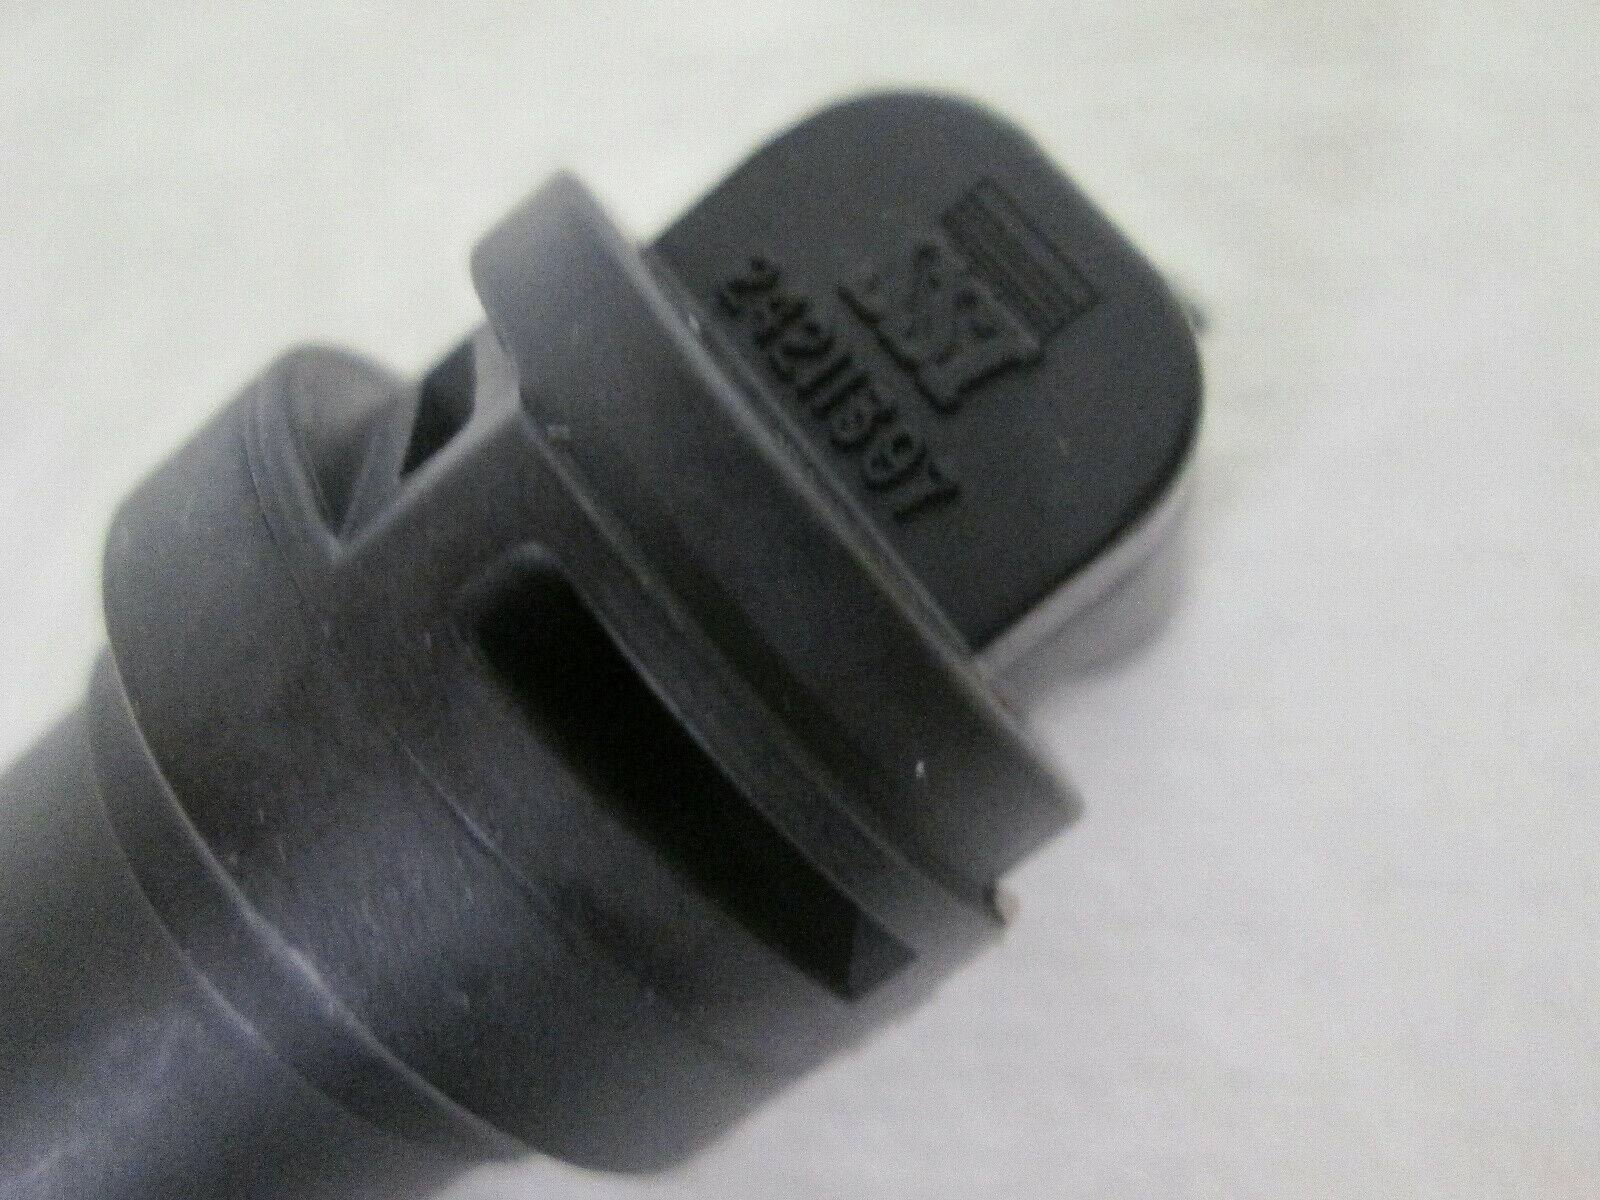 NEW AC Delco 24211397 Genuine GM Automatic Transmission Input Speed Sensor image 2